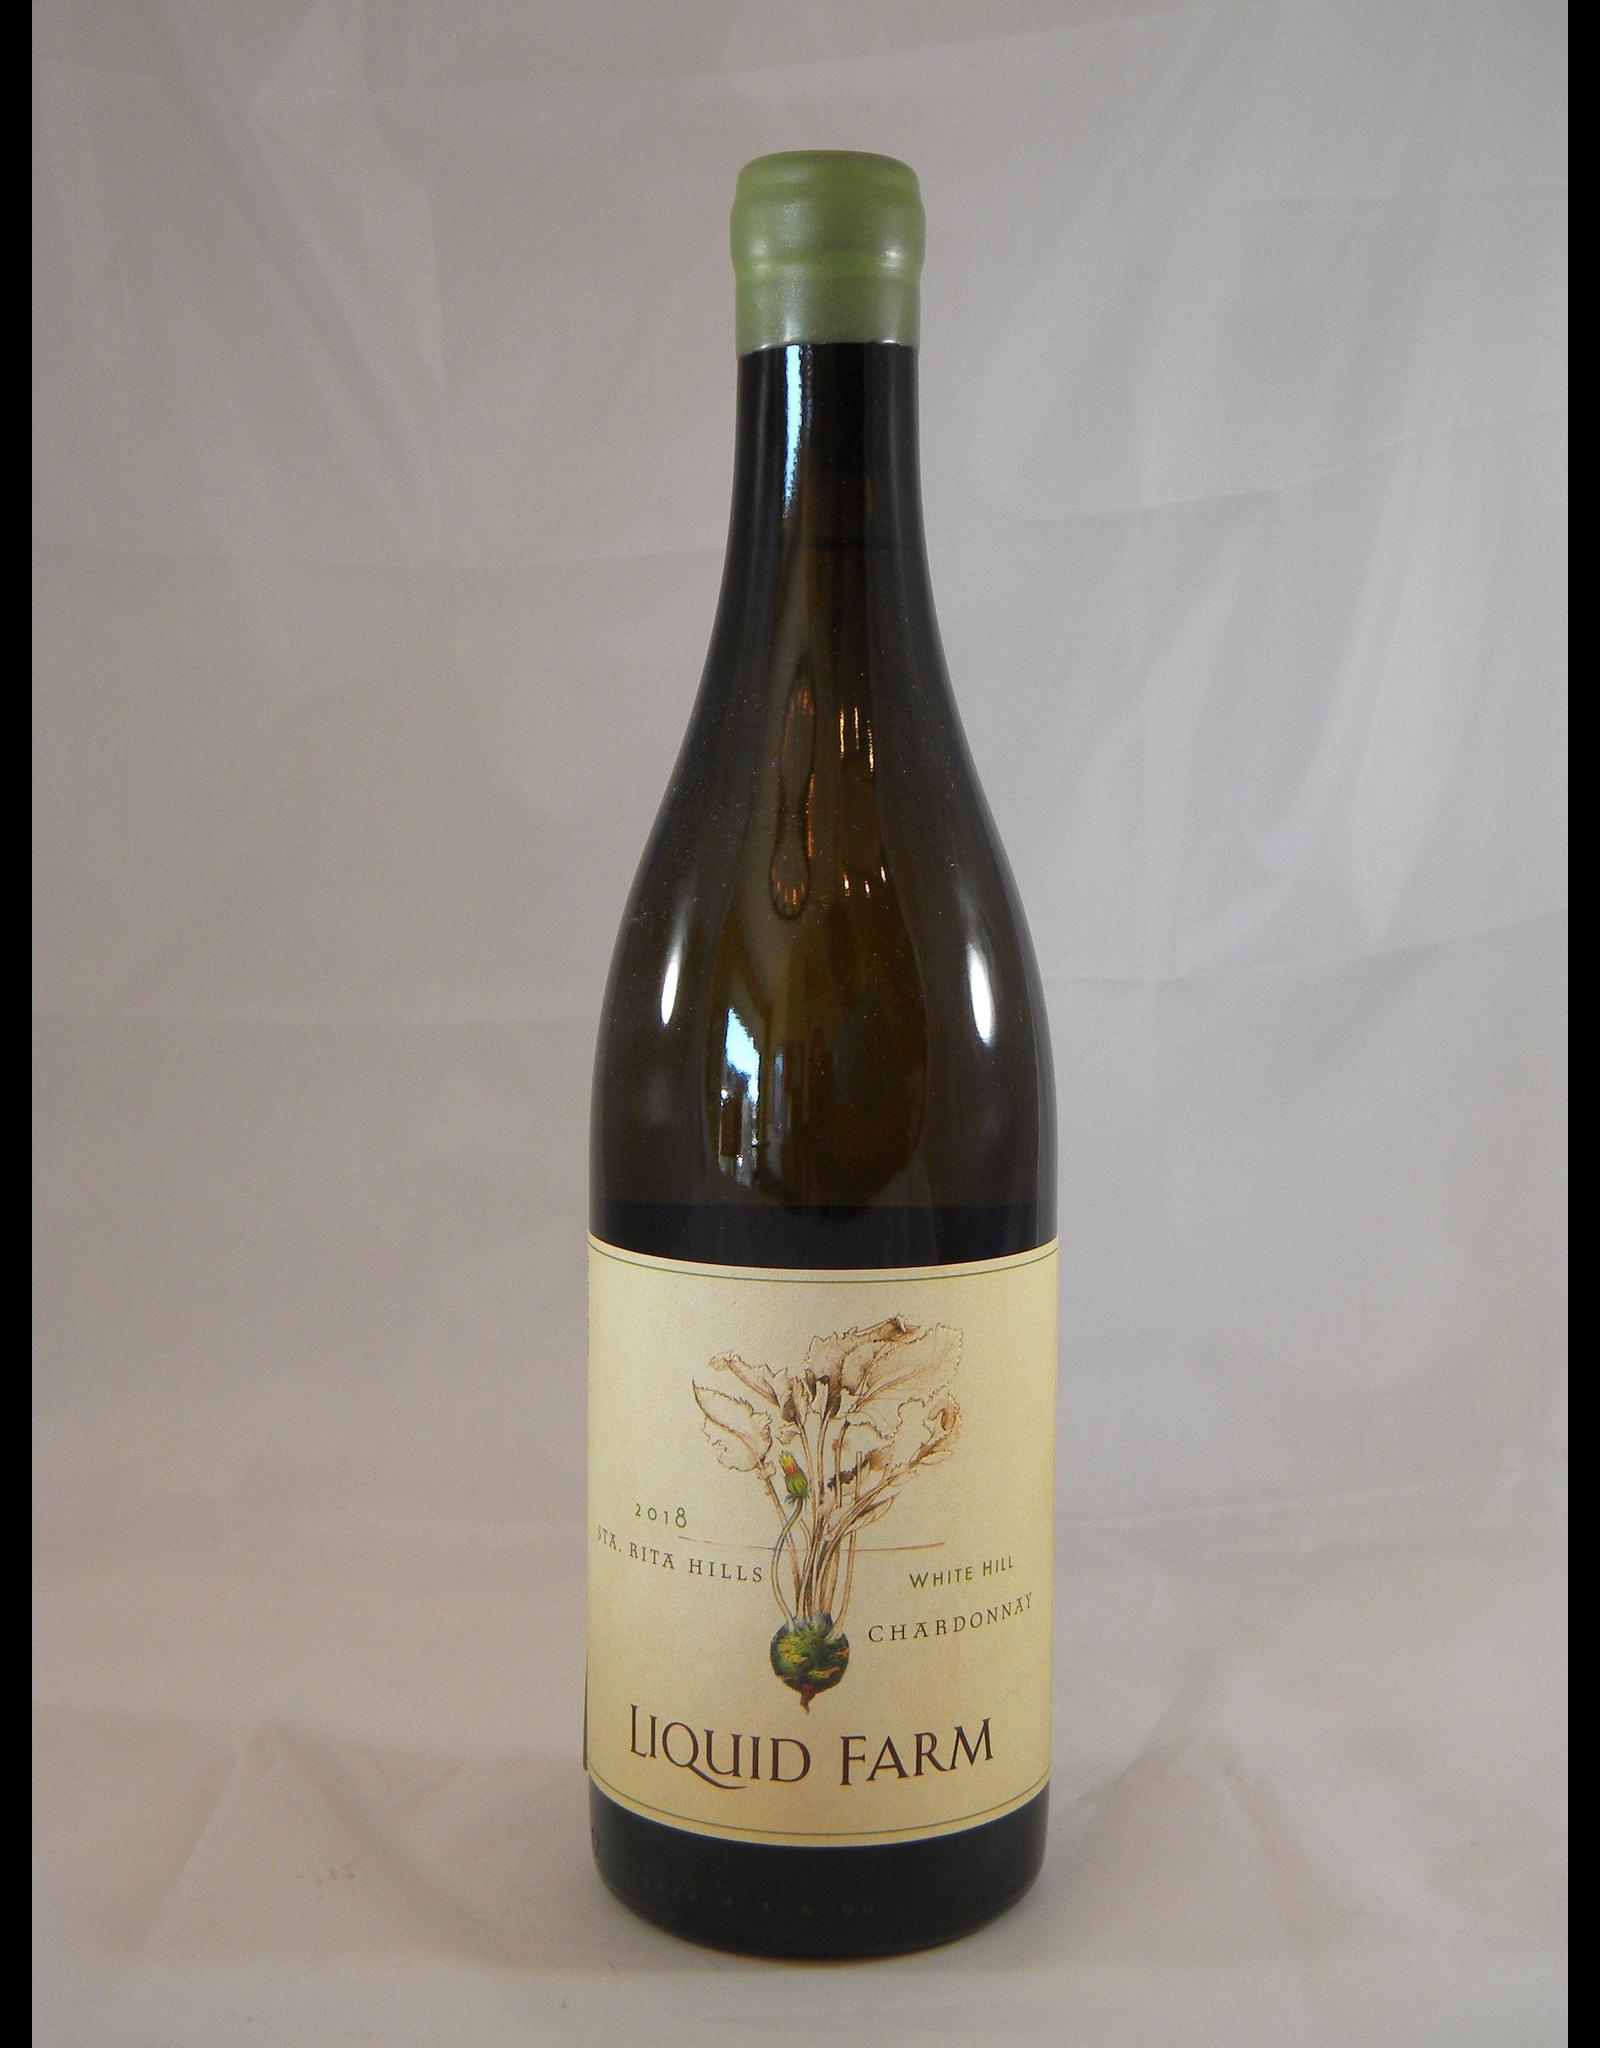 Liquid Farm Chardonnay Santa Rita Hills White Hill 2018